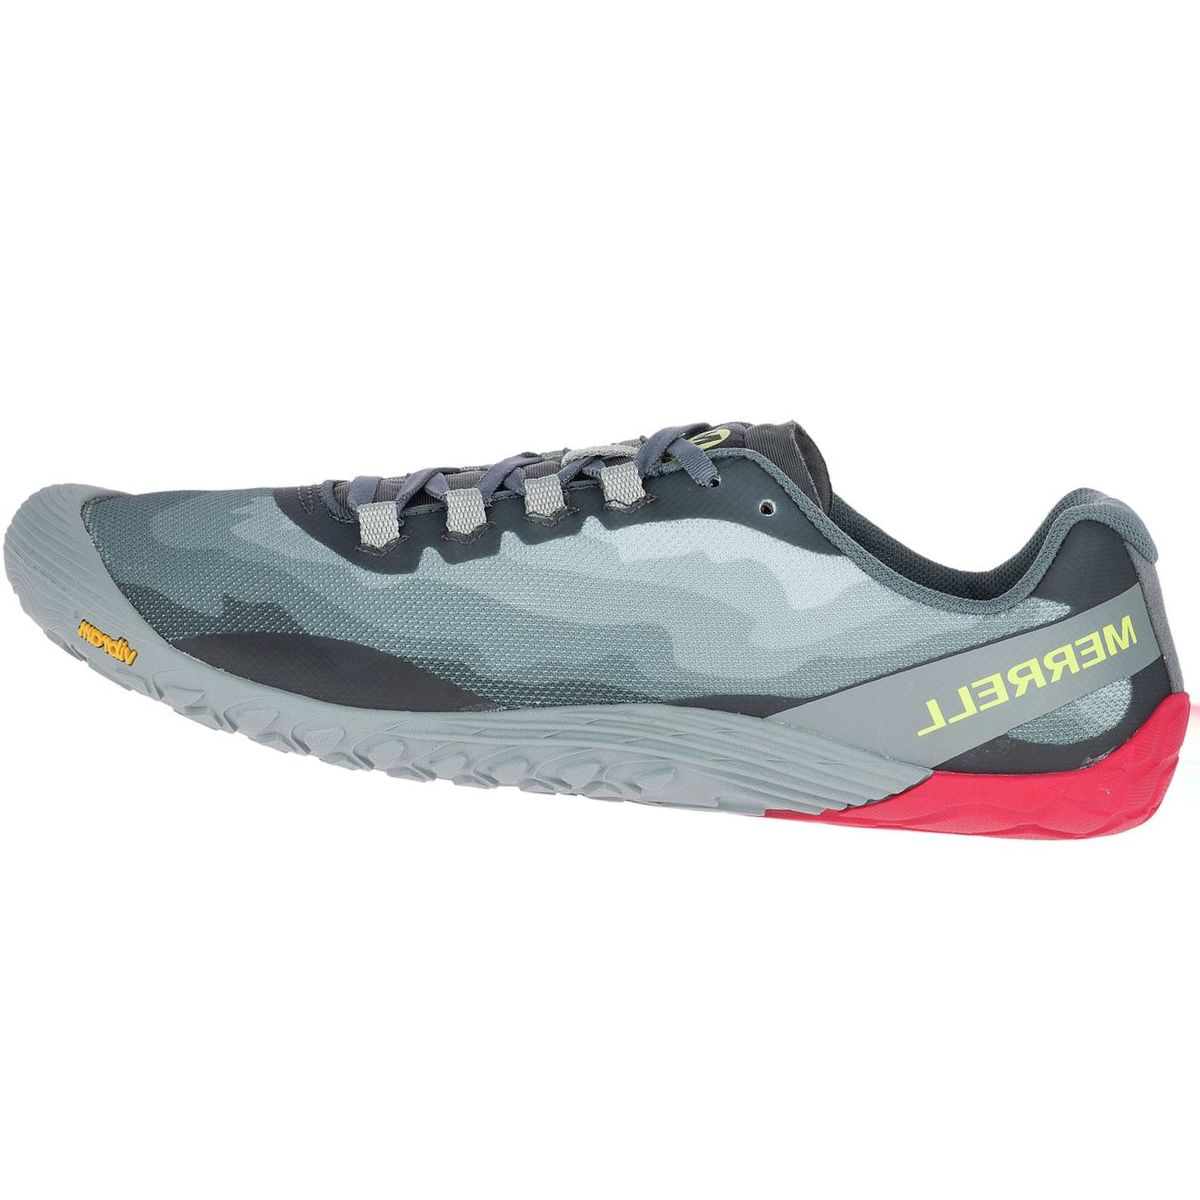 Merrell Vapor Glove 4 Shoe - Men's